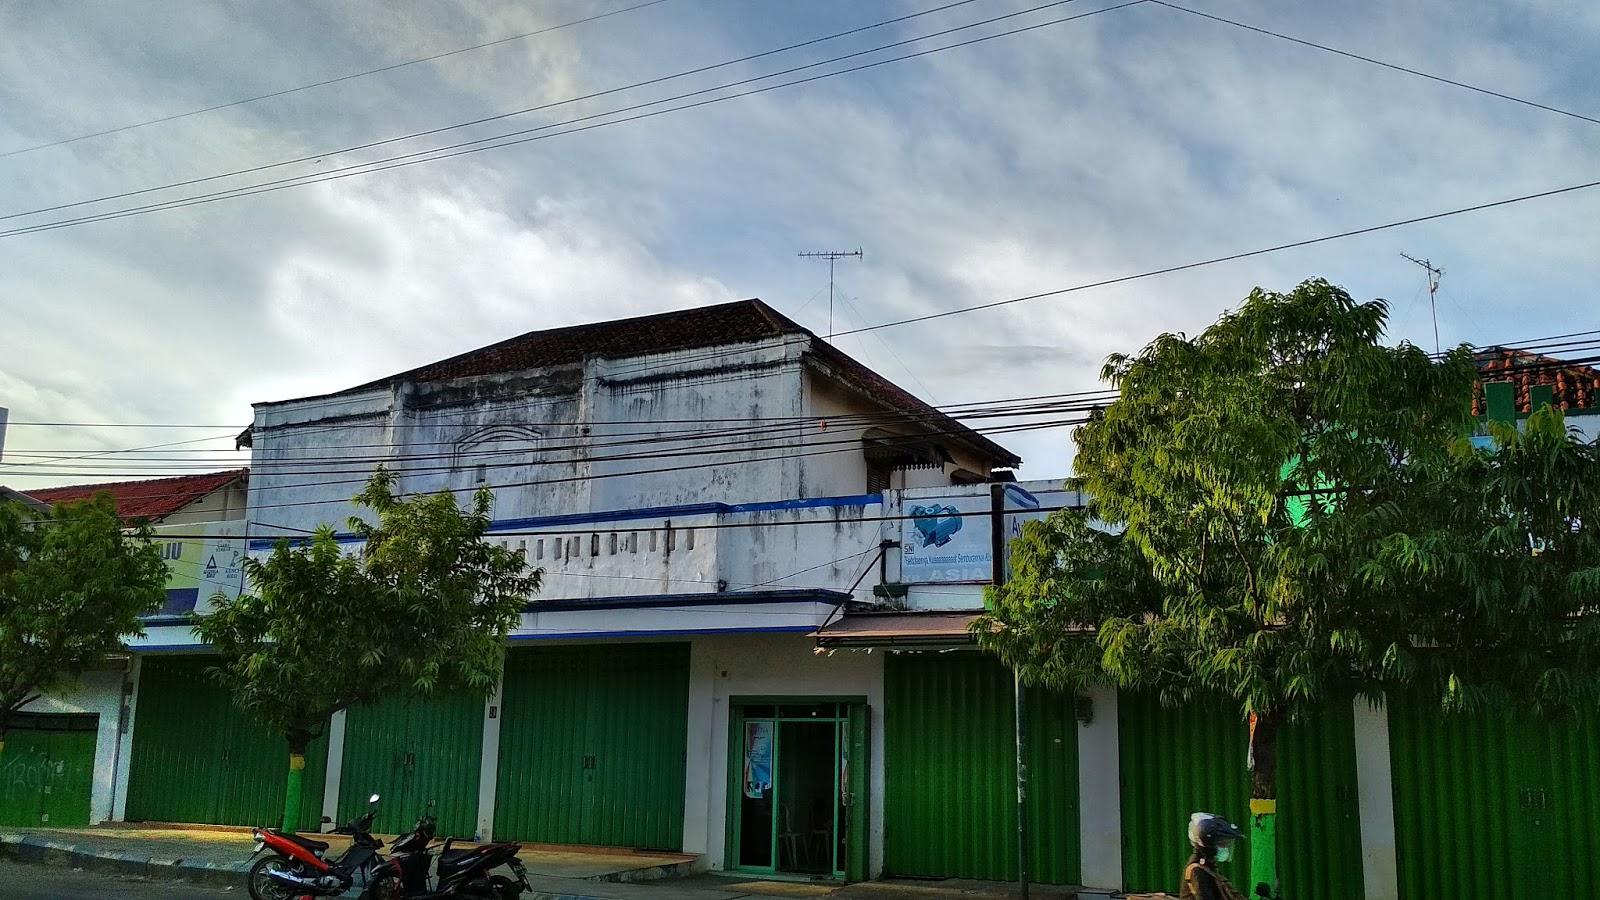 Jejak Aswary Agansya Eksplore Kota Kediaman Sampang Stasiun Kereta Api